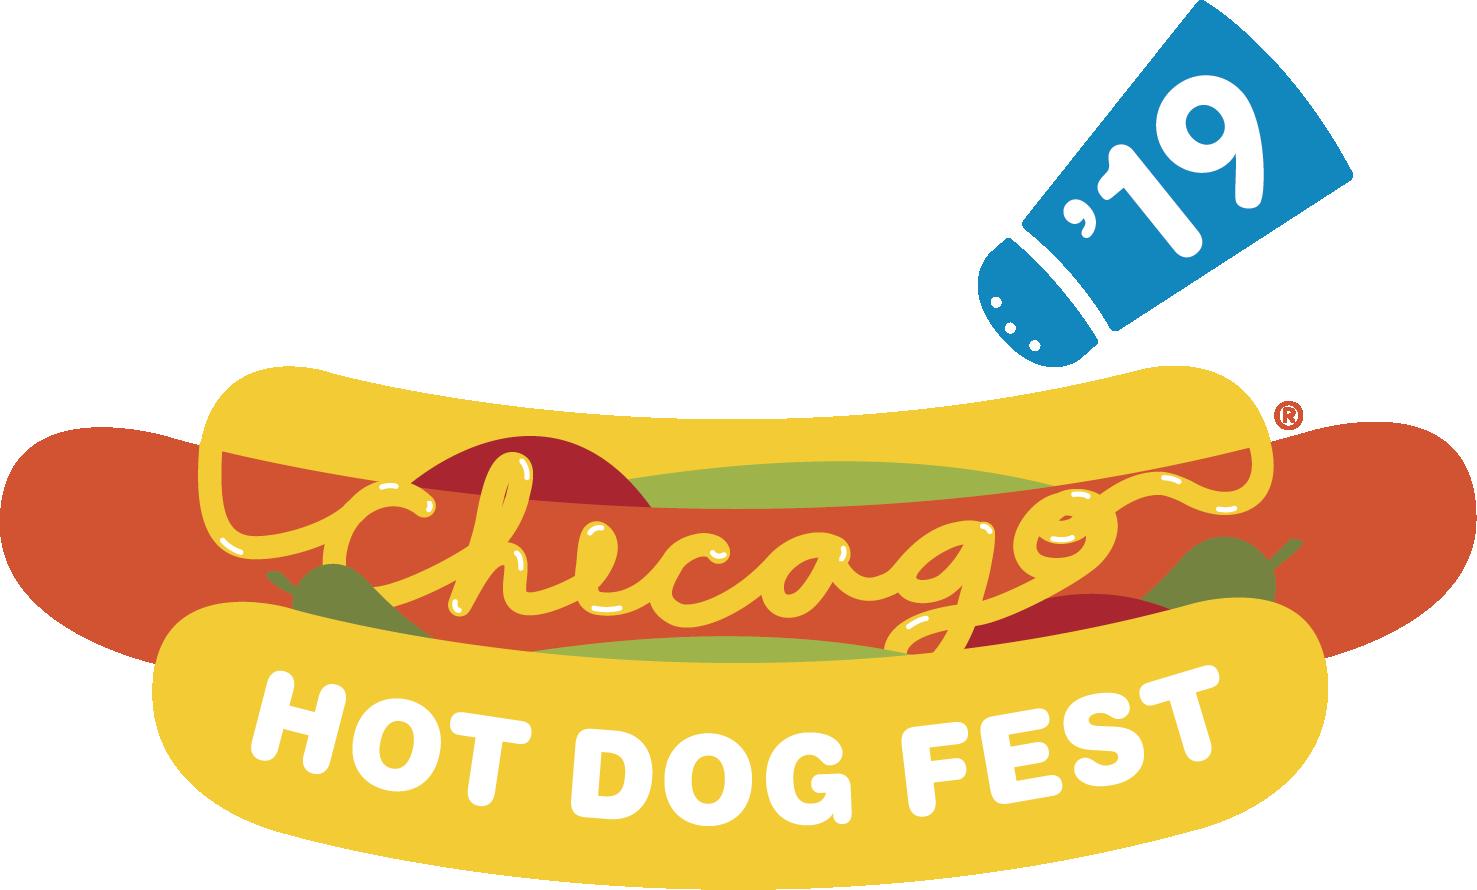 Chicago Hot Dog Fest 2019